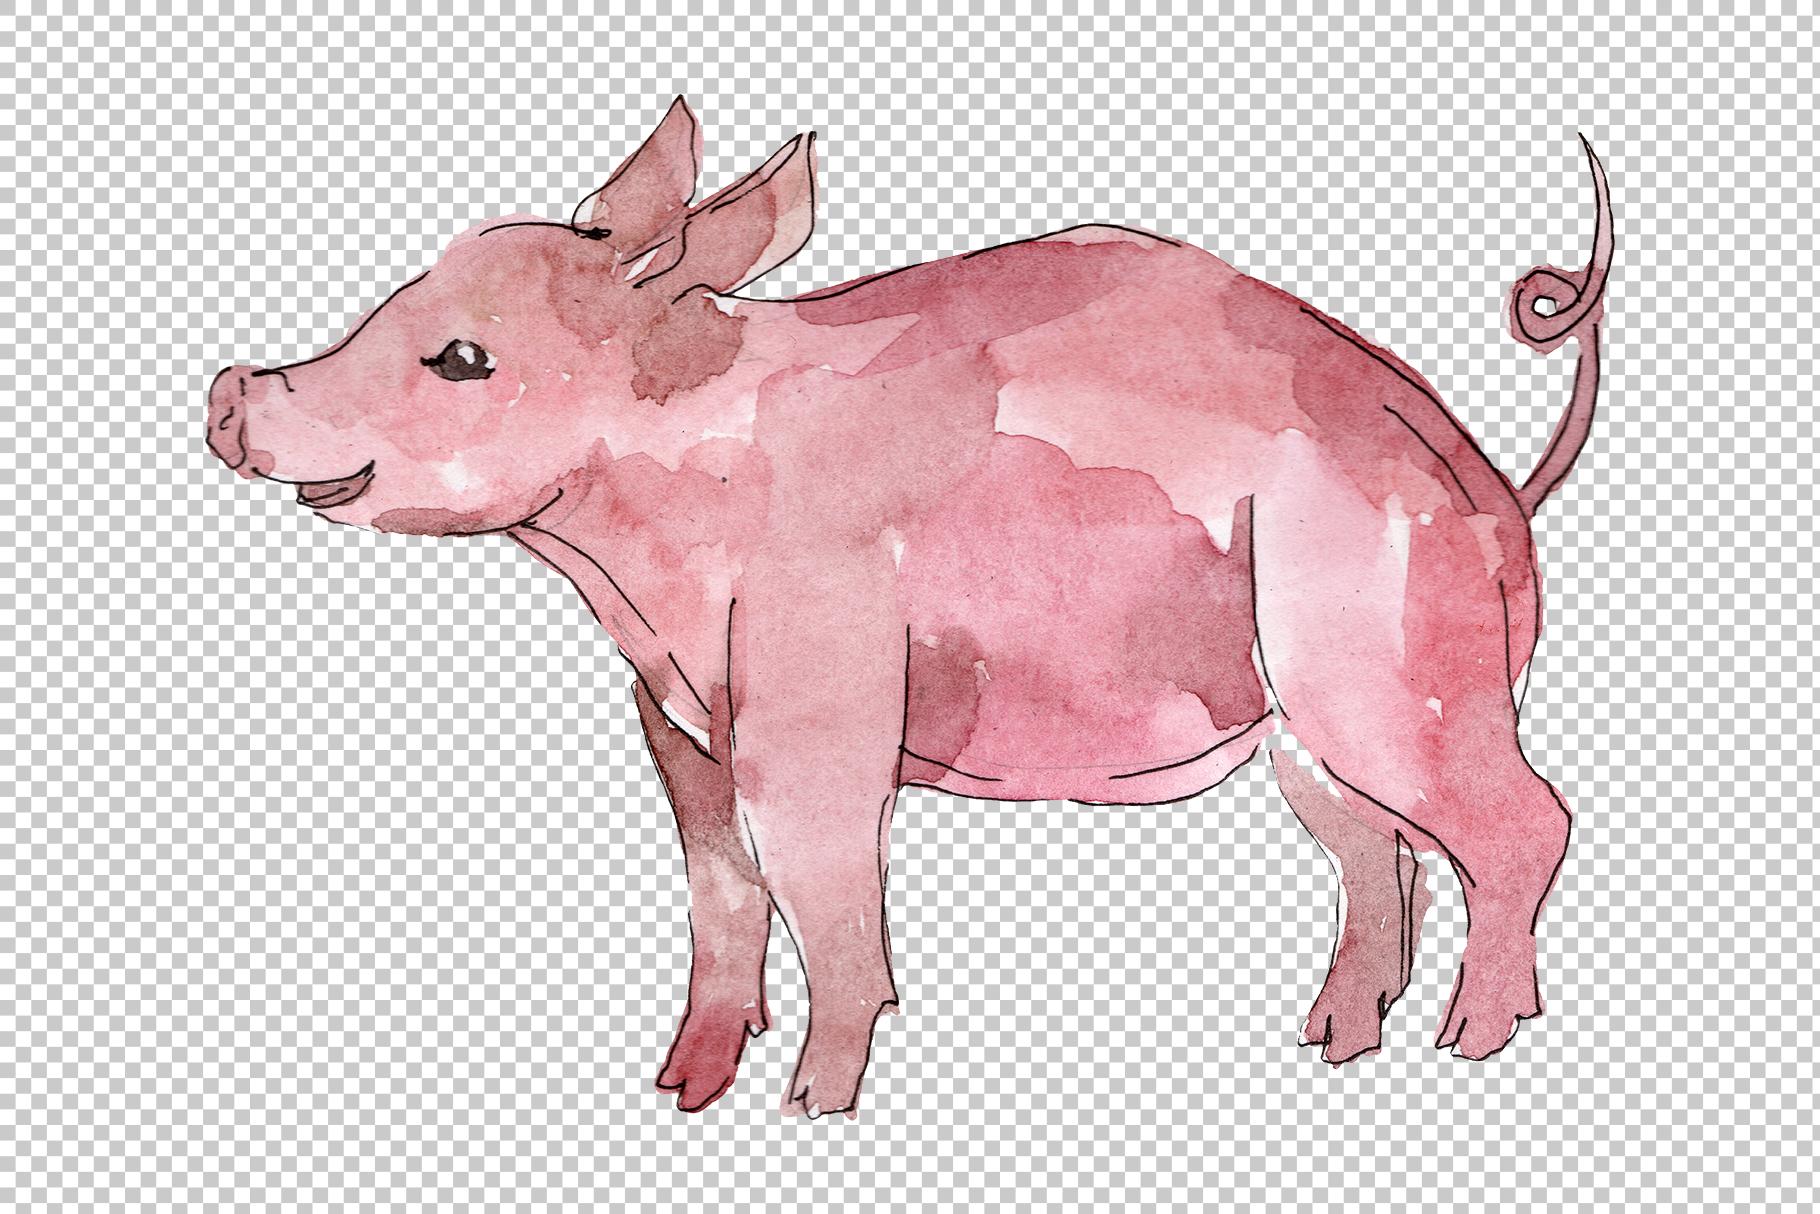 Farm animals pig boar Watercolor png example image 6